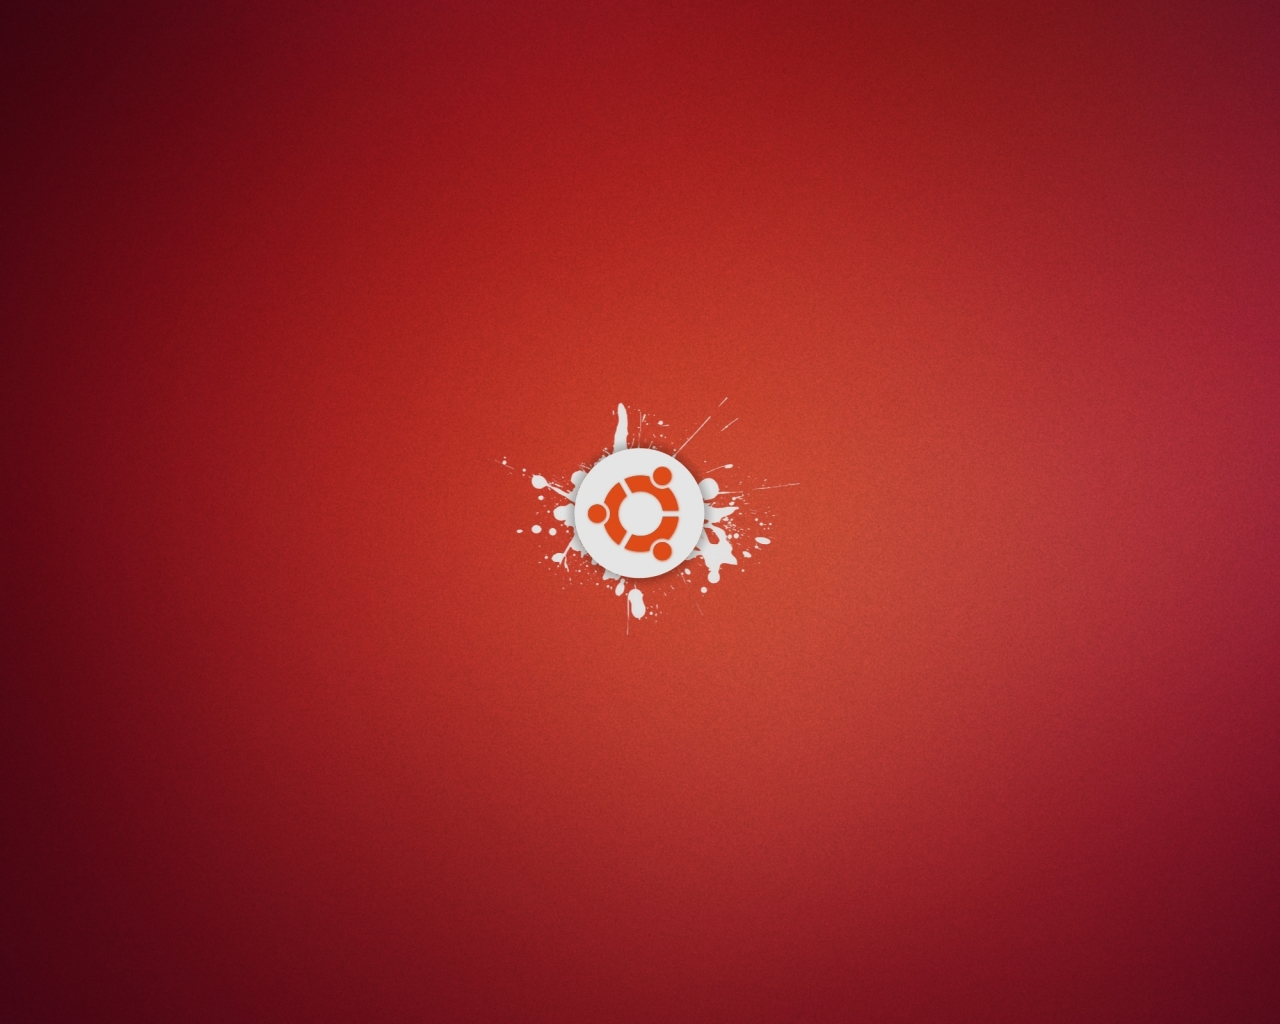 Ubuntu abstracto rojo - 1280x1024